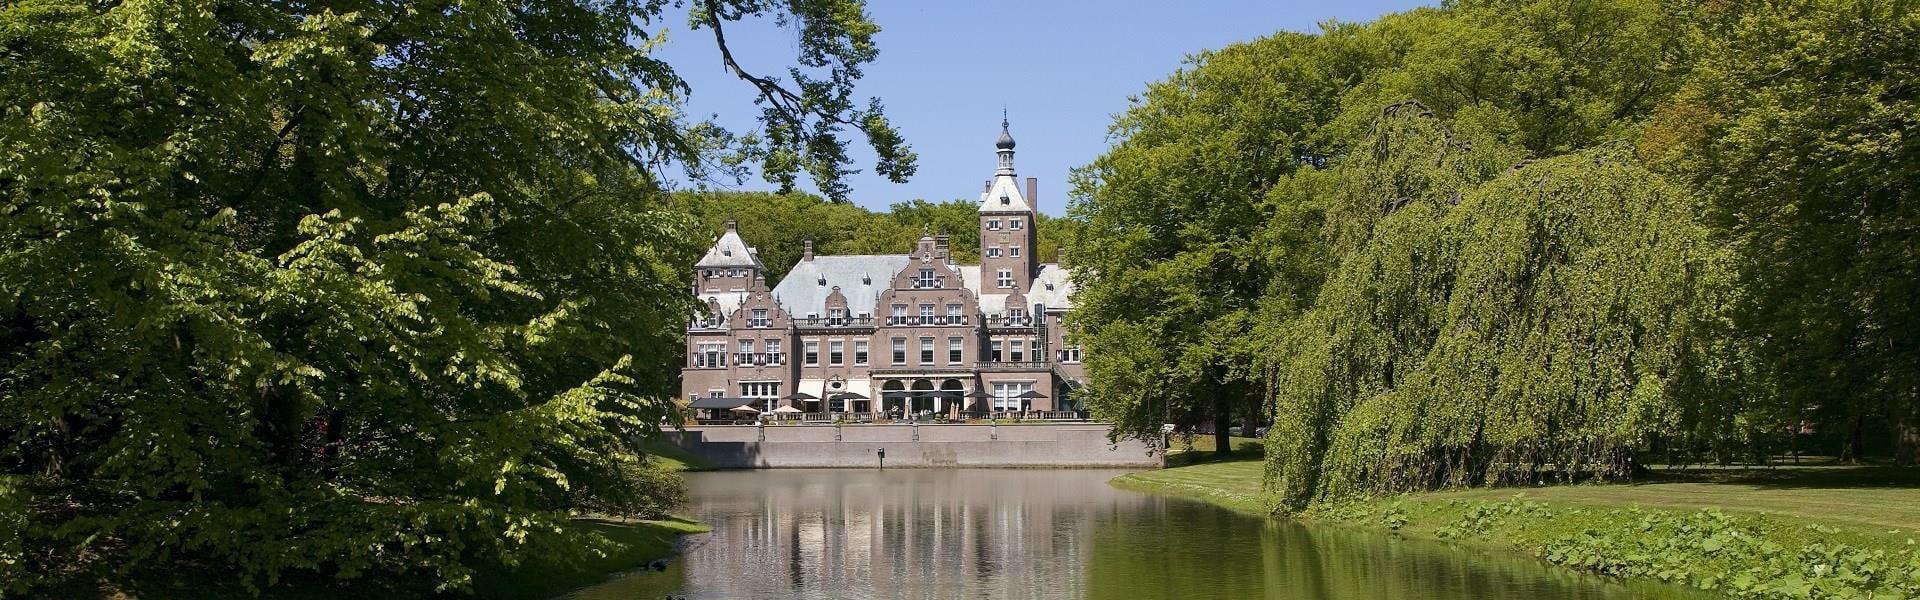 Nederland   Landgoederenroute Kennemerland